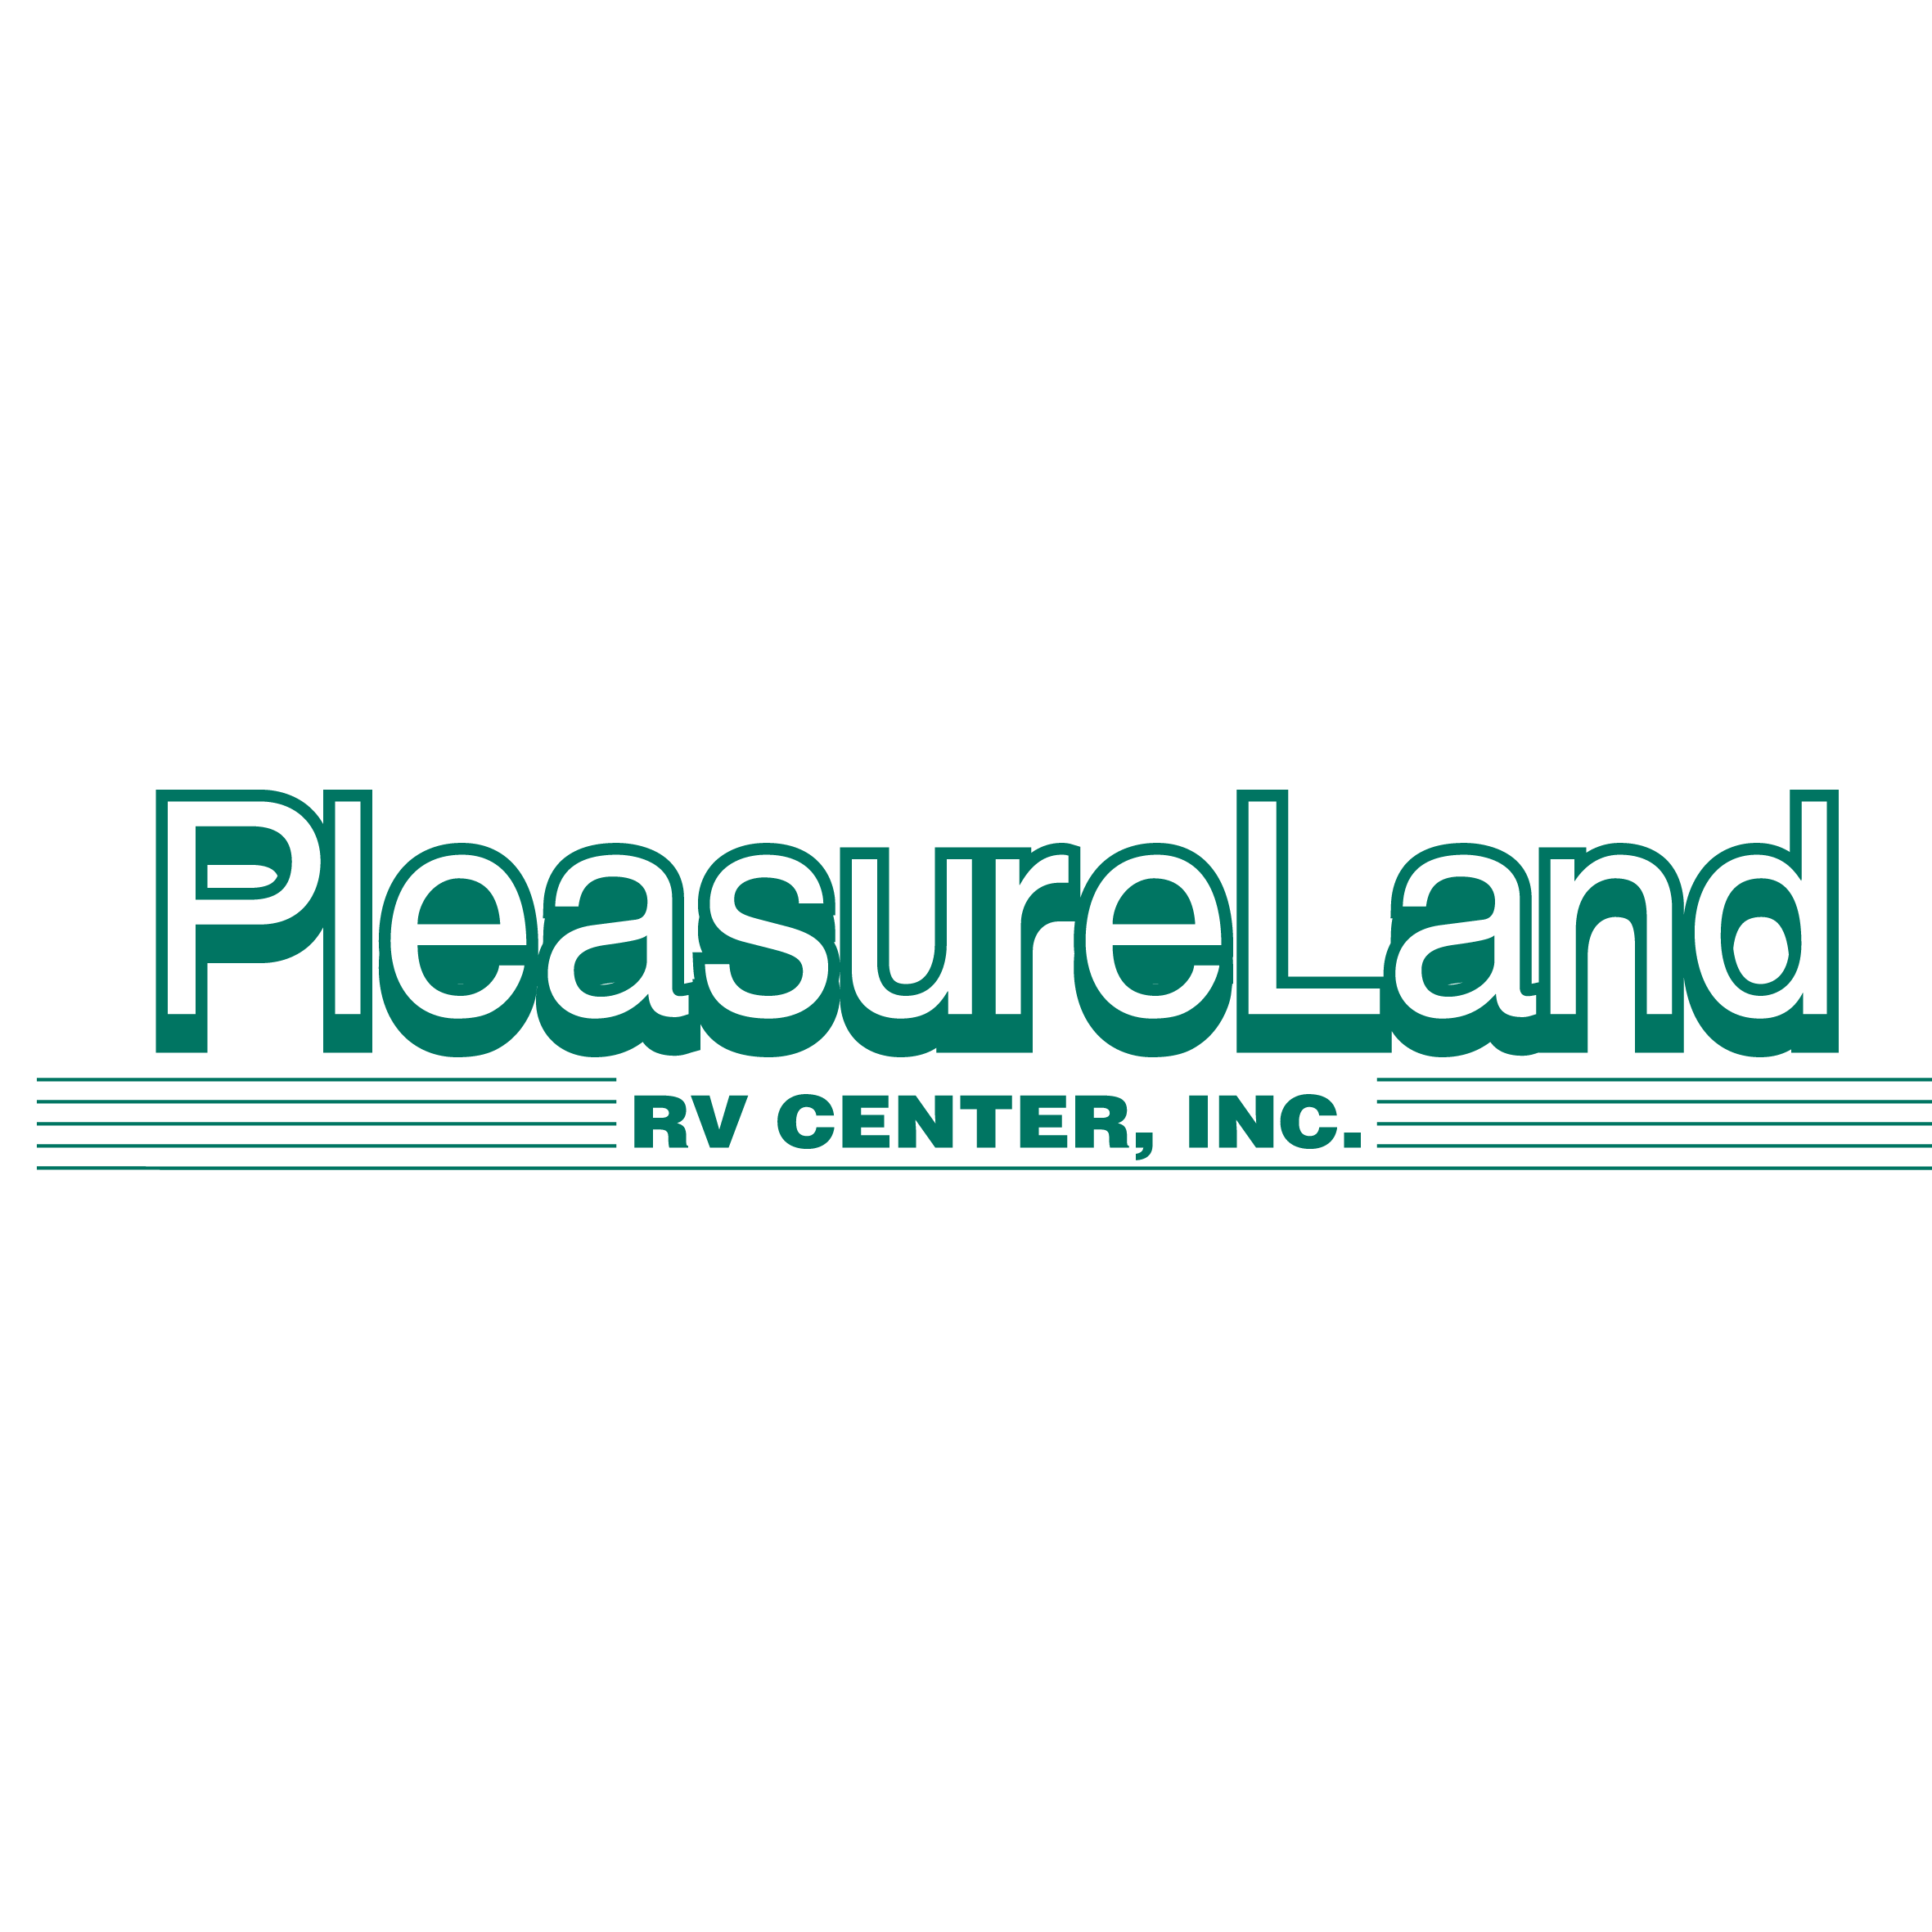 Pleasureland RV Center - Sioux Falls